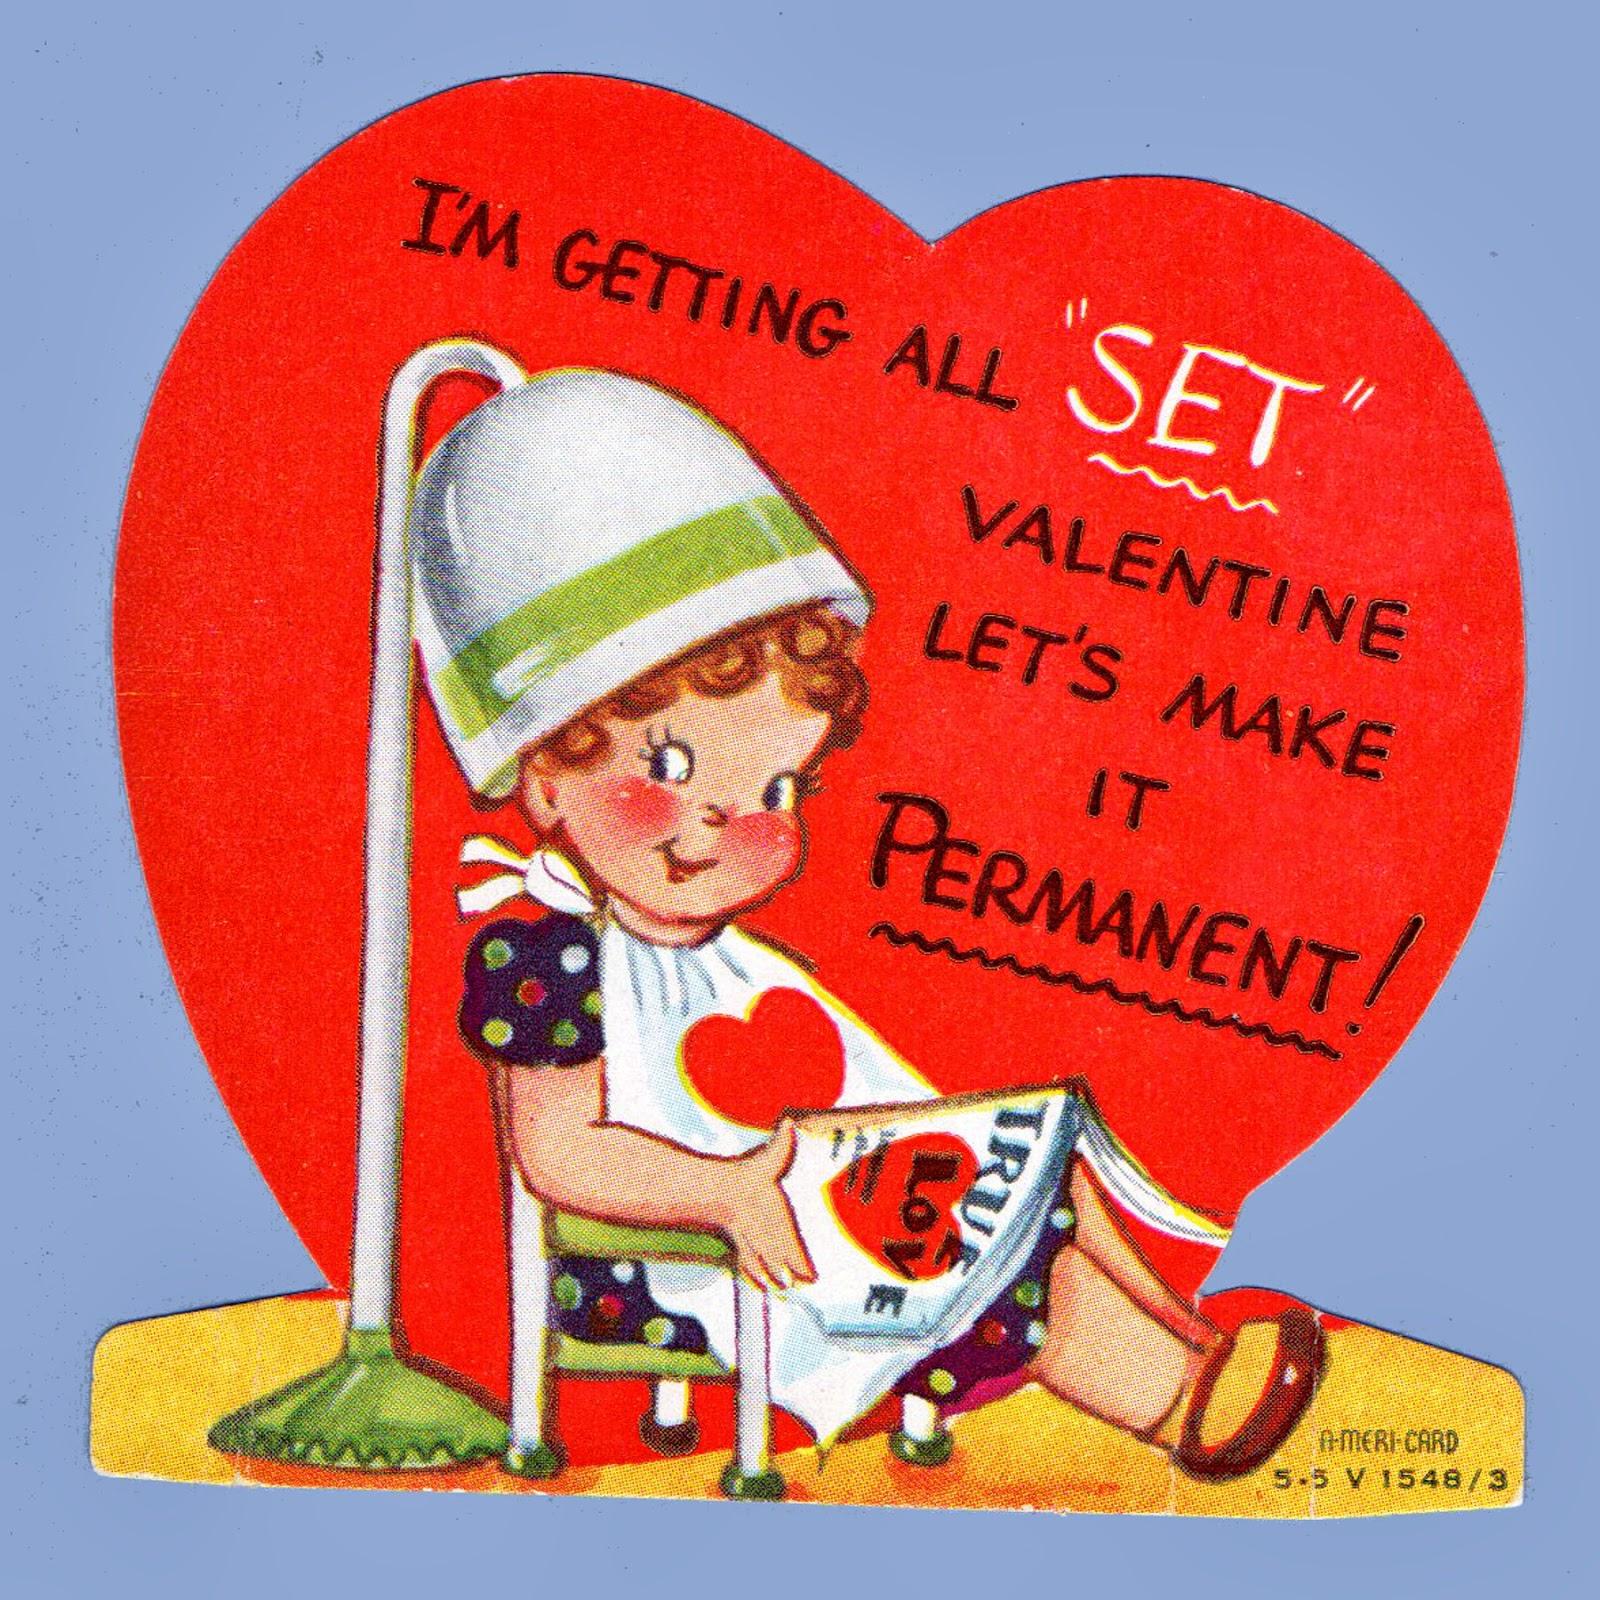 Iu0027m Getting All SET Valentine Letu0027s Make It PERMANENT!